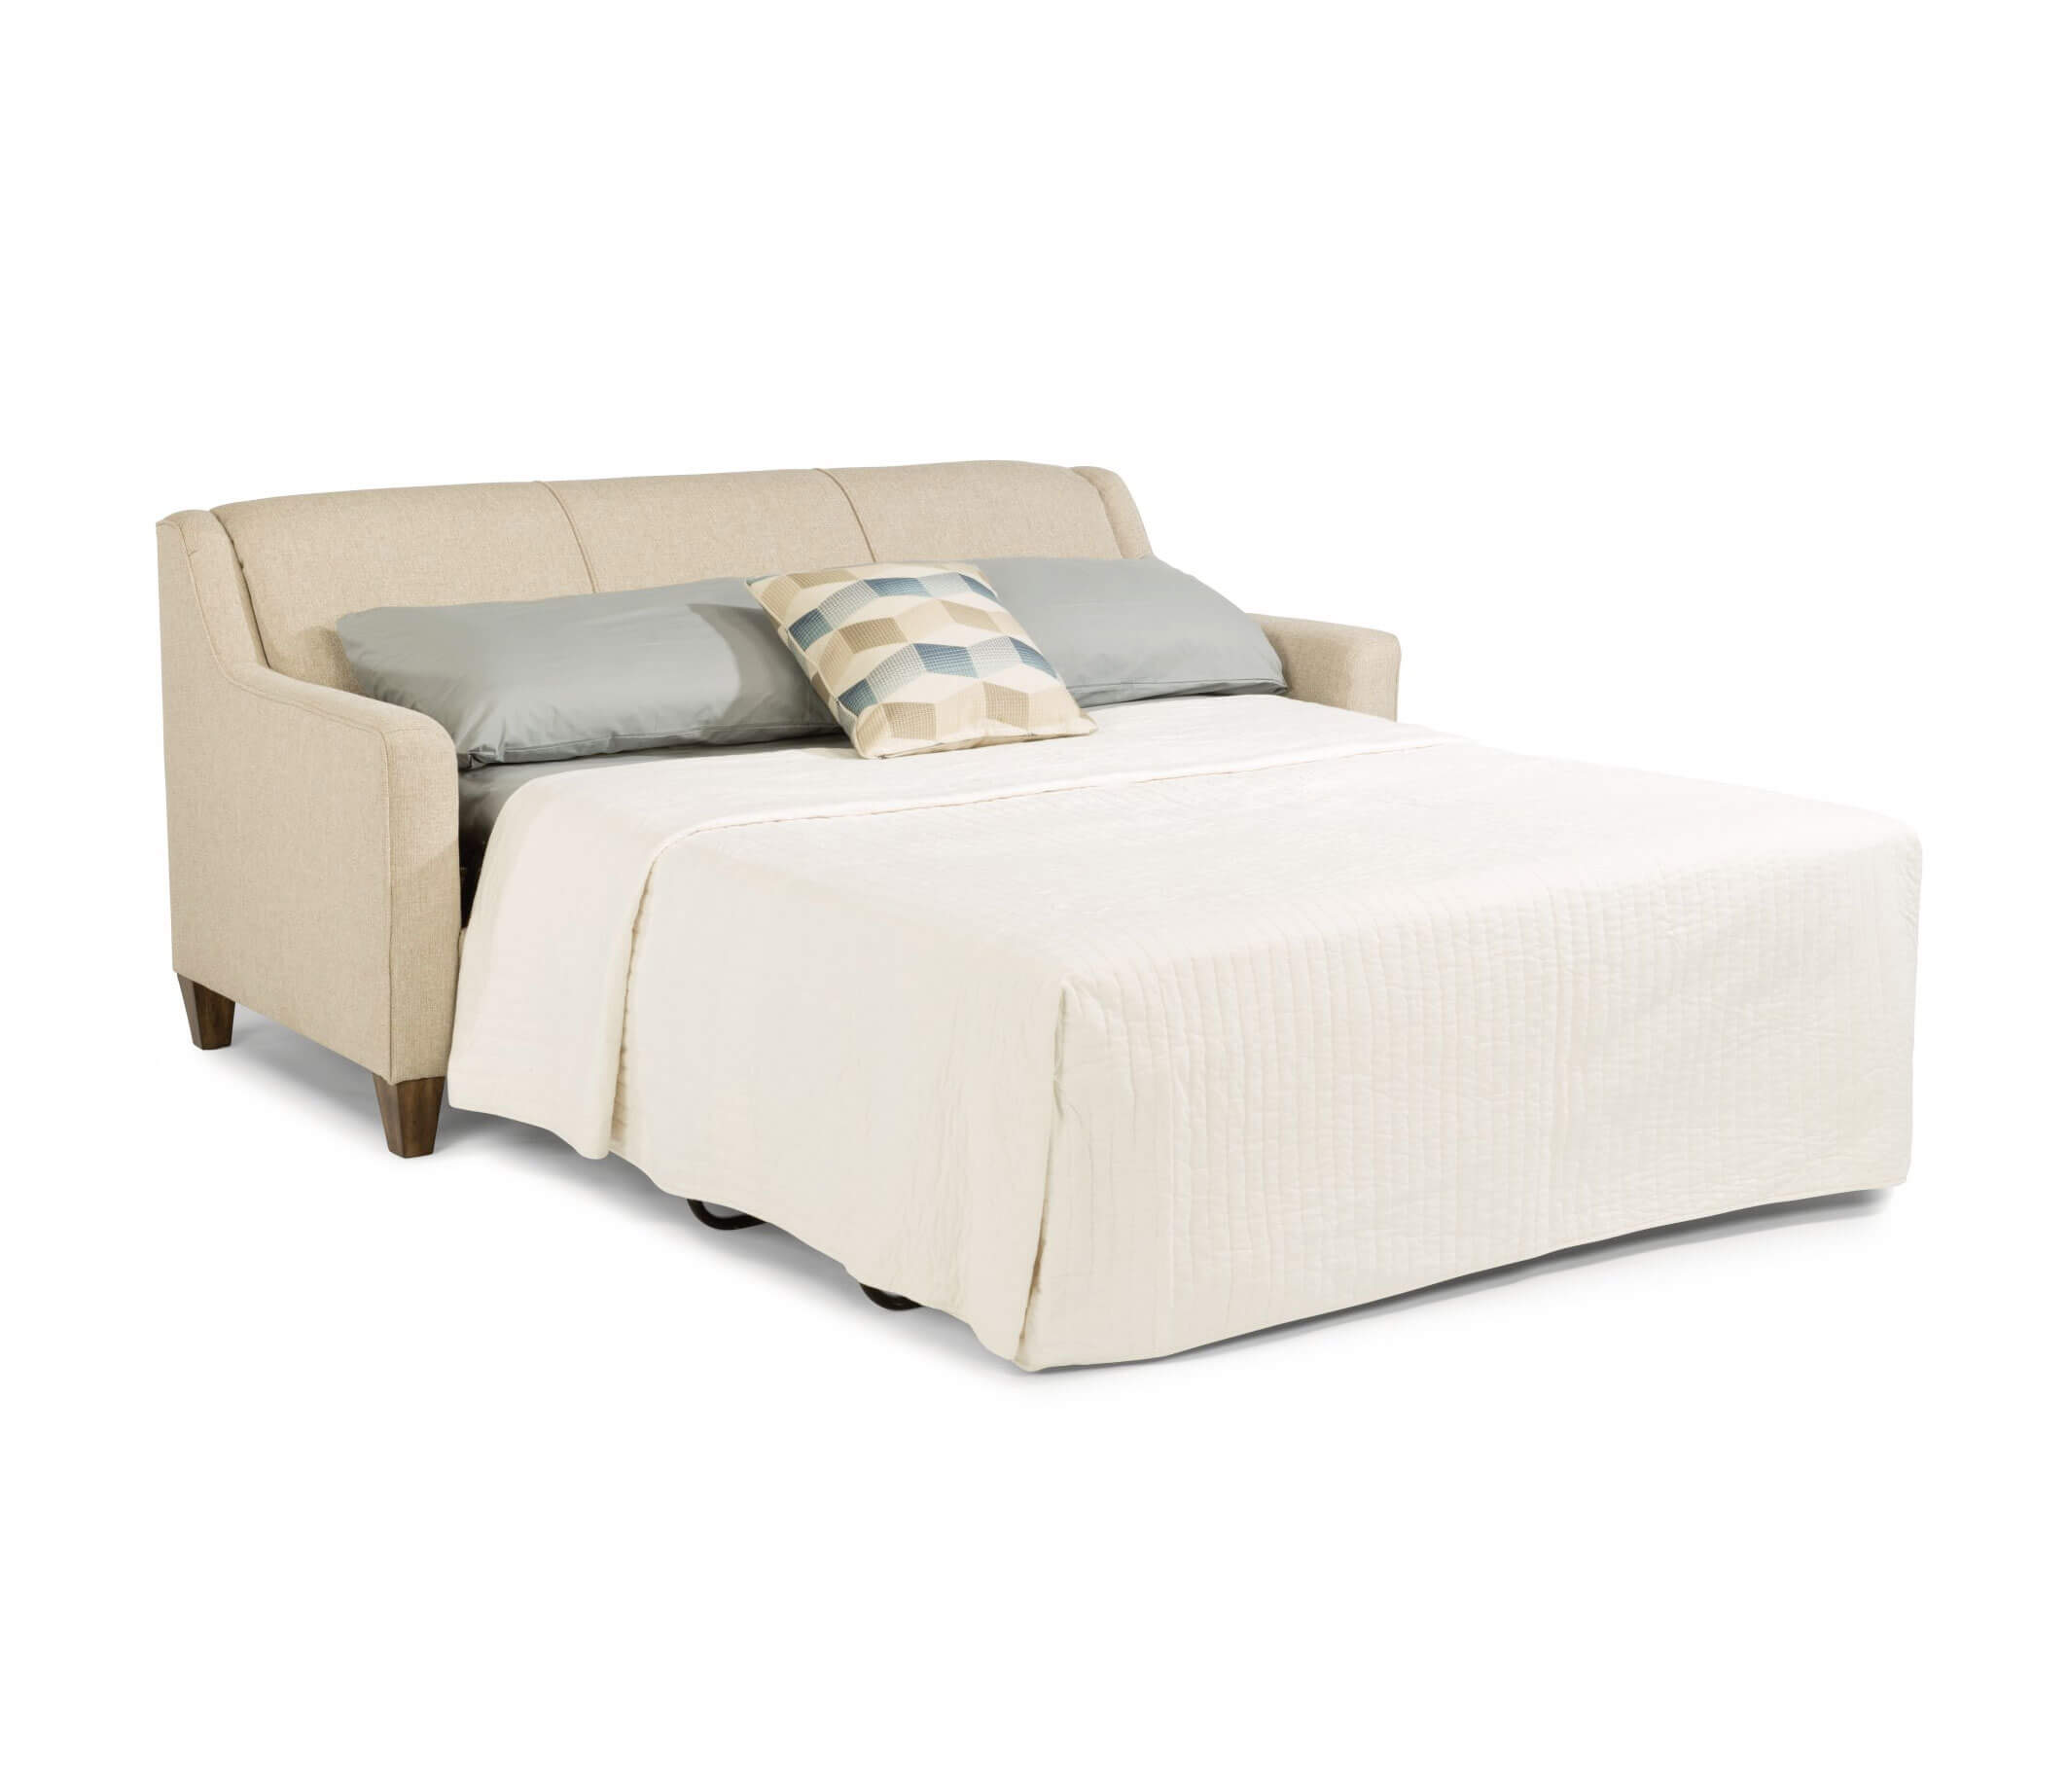 Admirable Holly Sleeper Sofa Bedrooms More Seattle Creativecarmelina Interior Chair Design Creativecarmelinacom